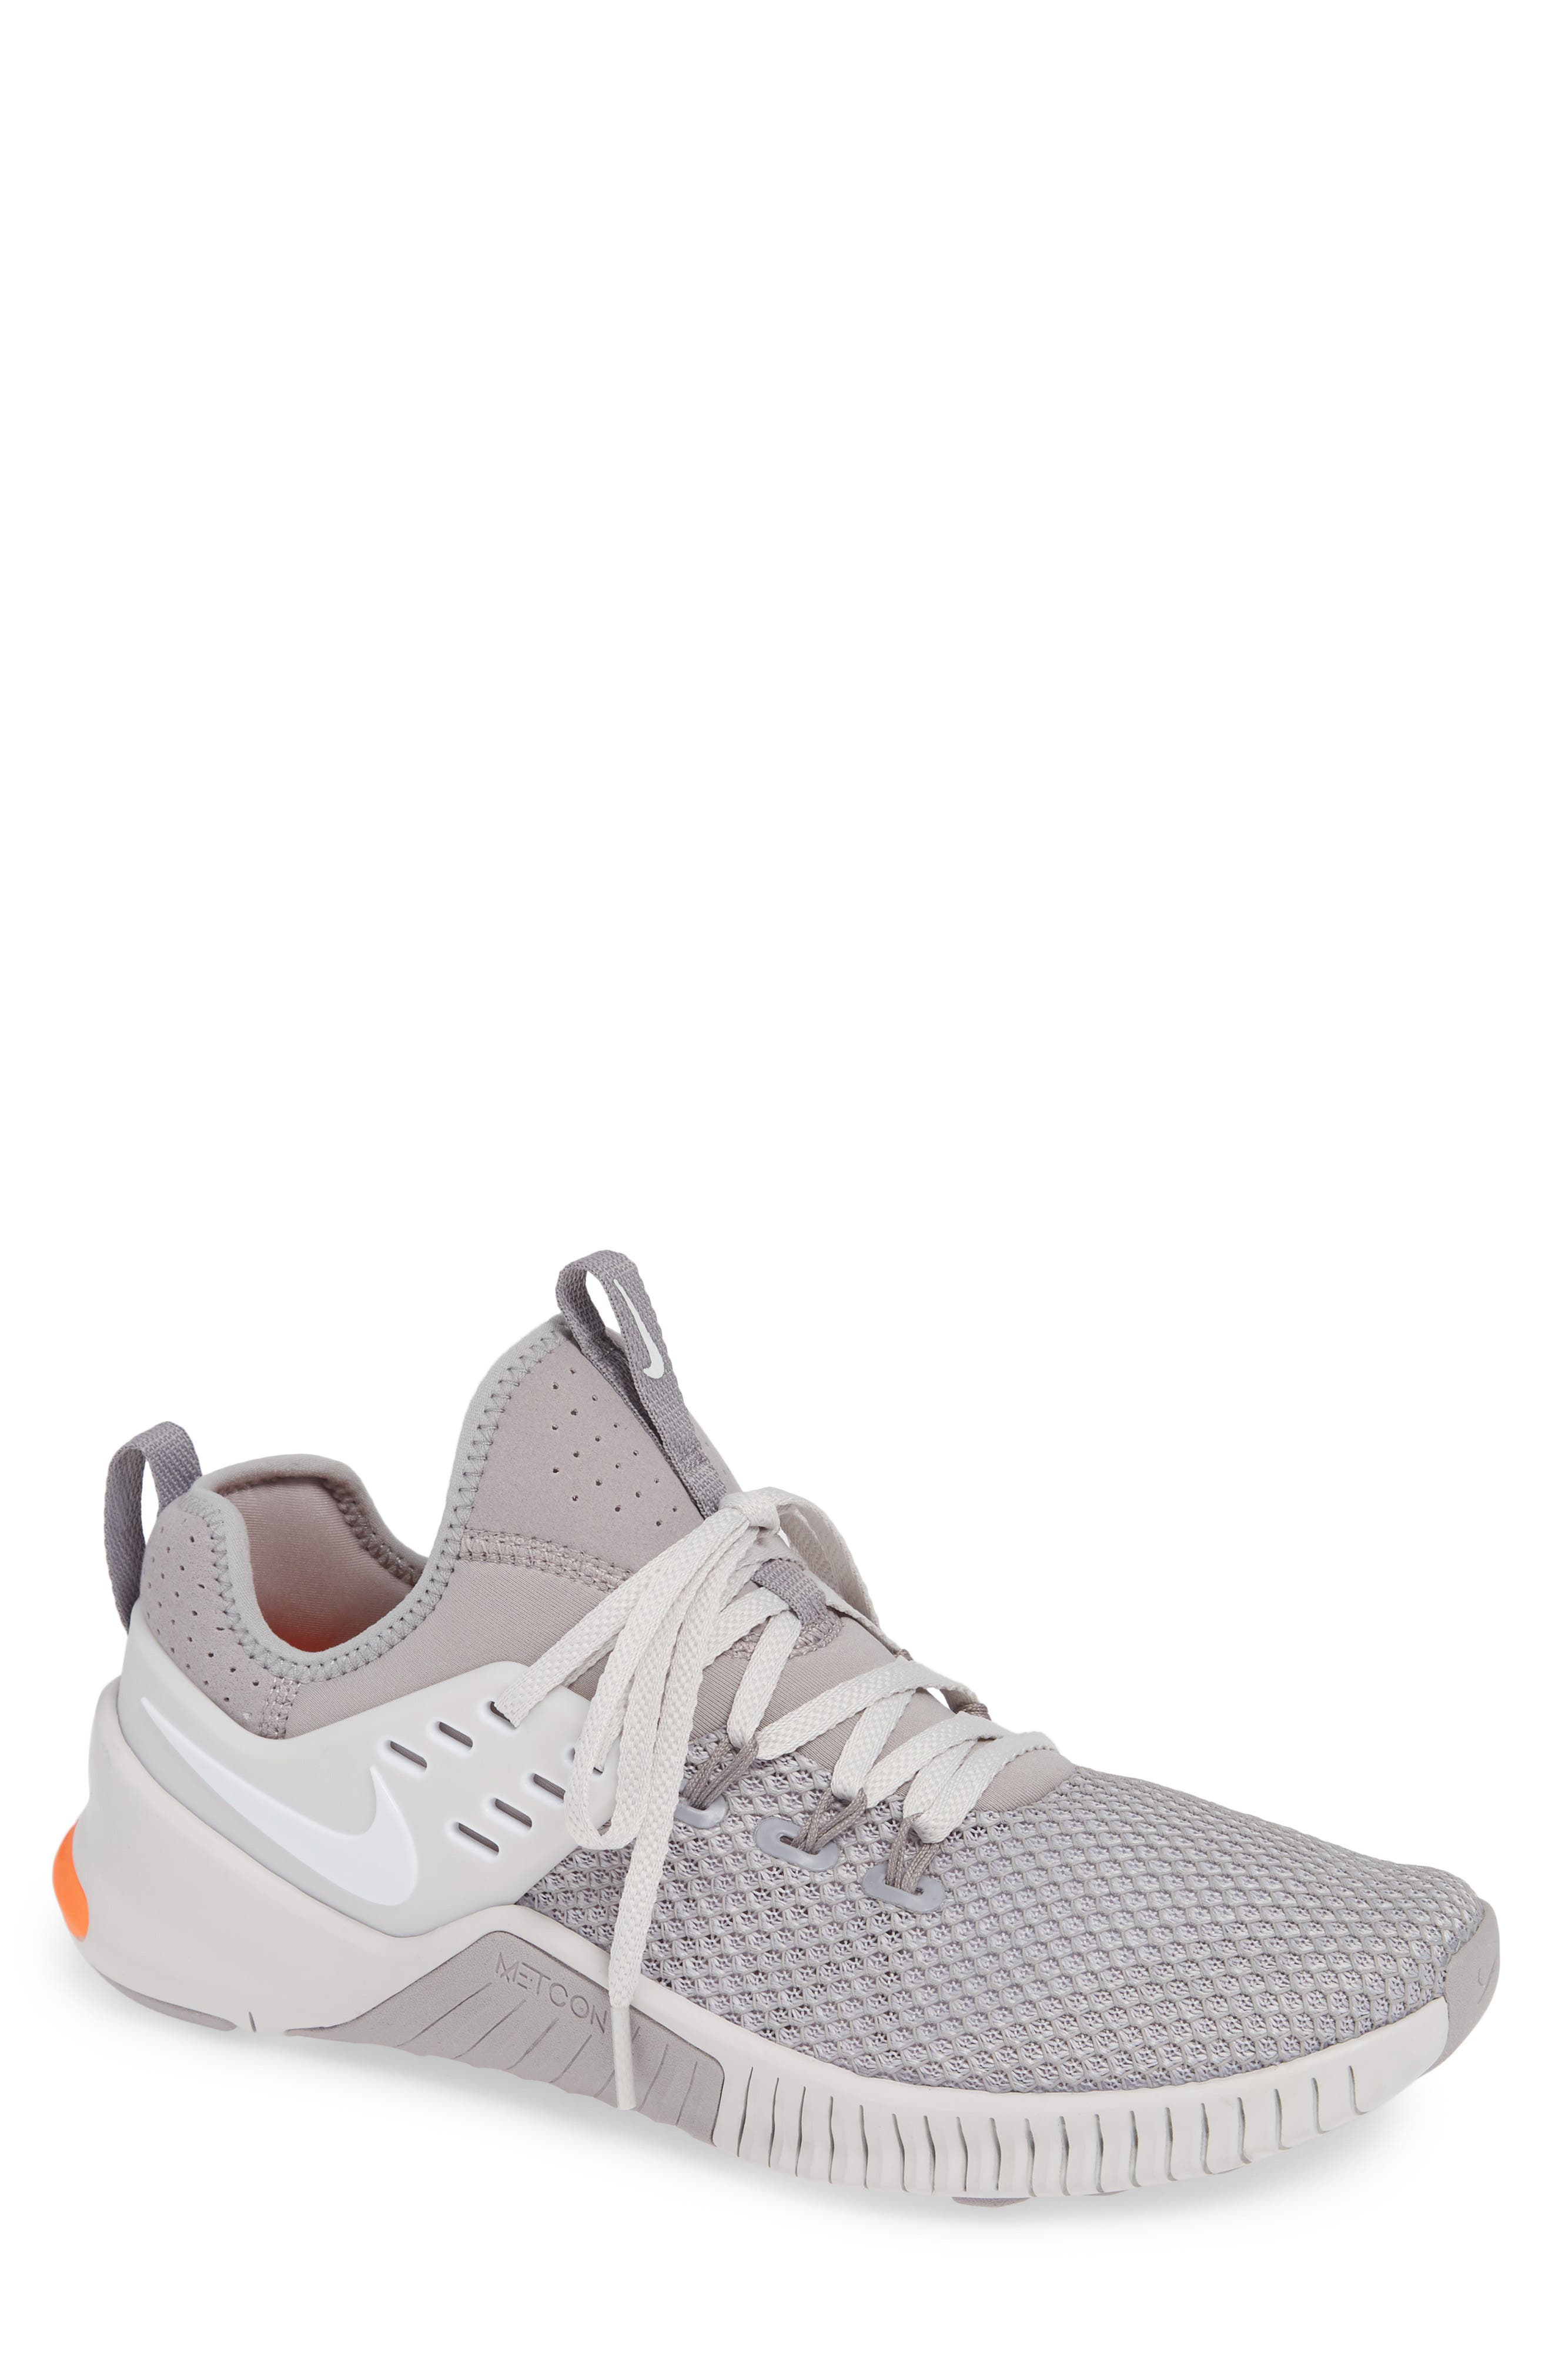 Free x Metcon Training Shoe,                         Main,                         color, GREY/ WHITE/ CRIMSON